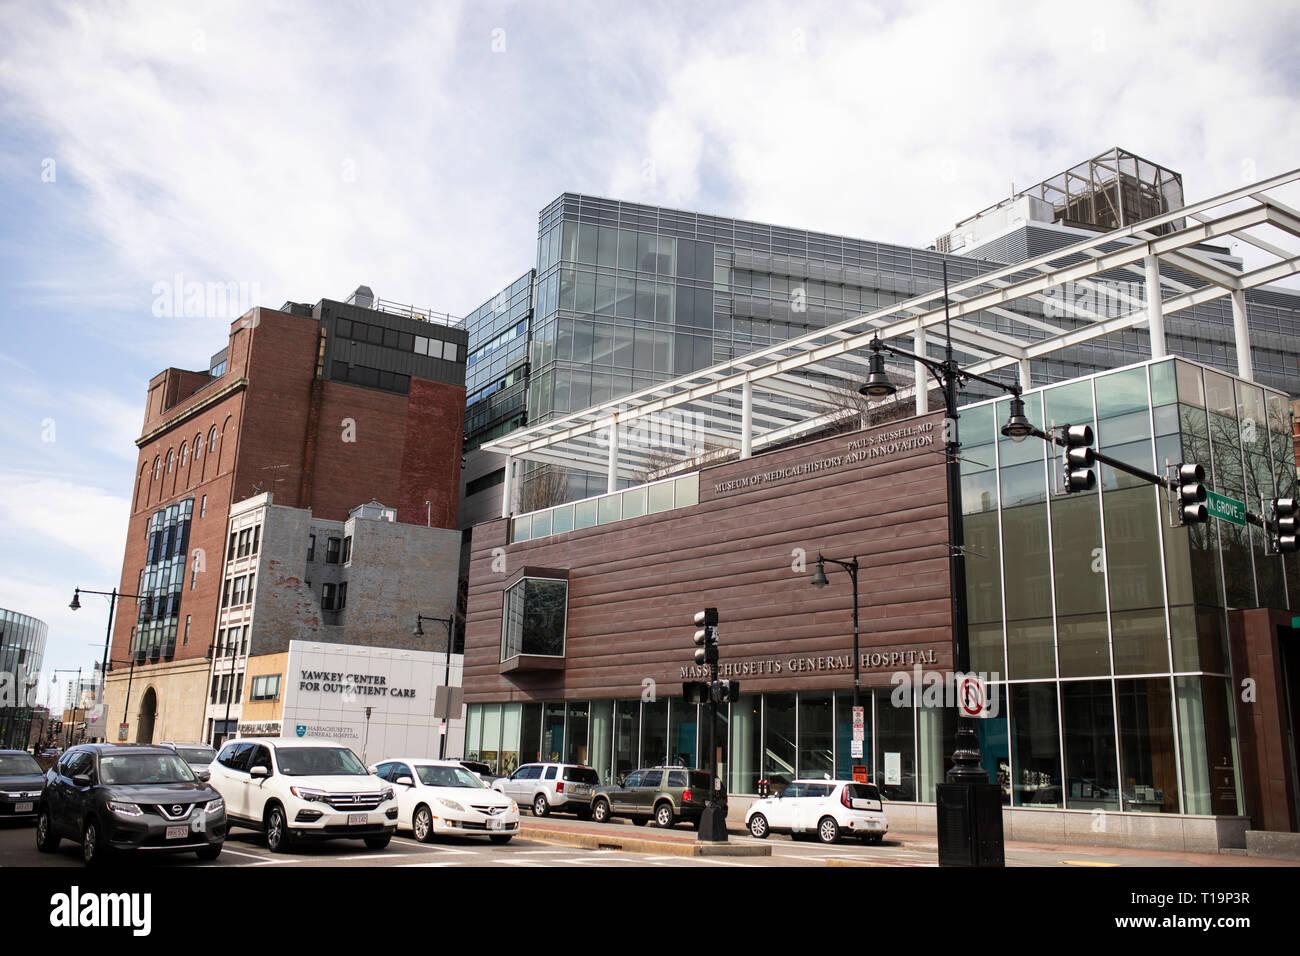 Massachusetts General Hospital building on Cambridge Street